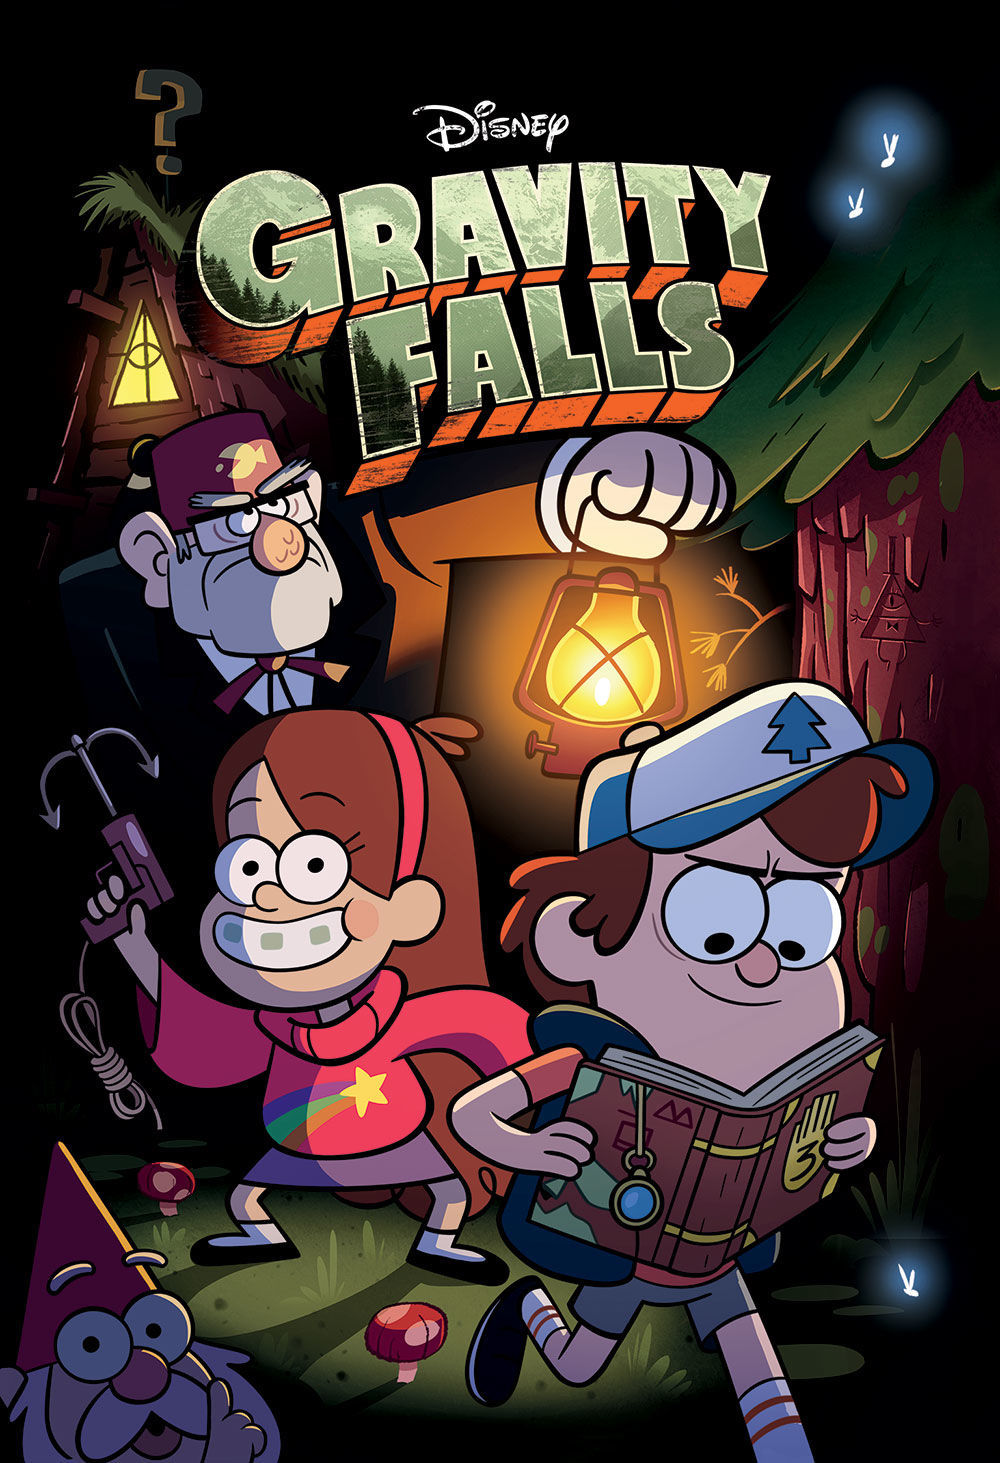 Gravity Falls Six Strange Tales 3 – Headhunters ผจญภัยเมืองมหัศจรรย์